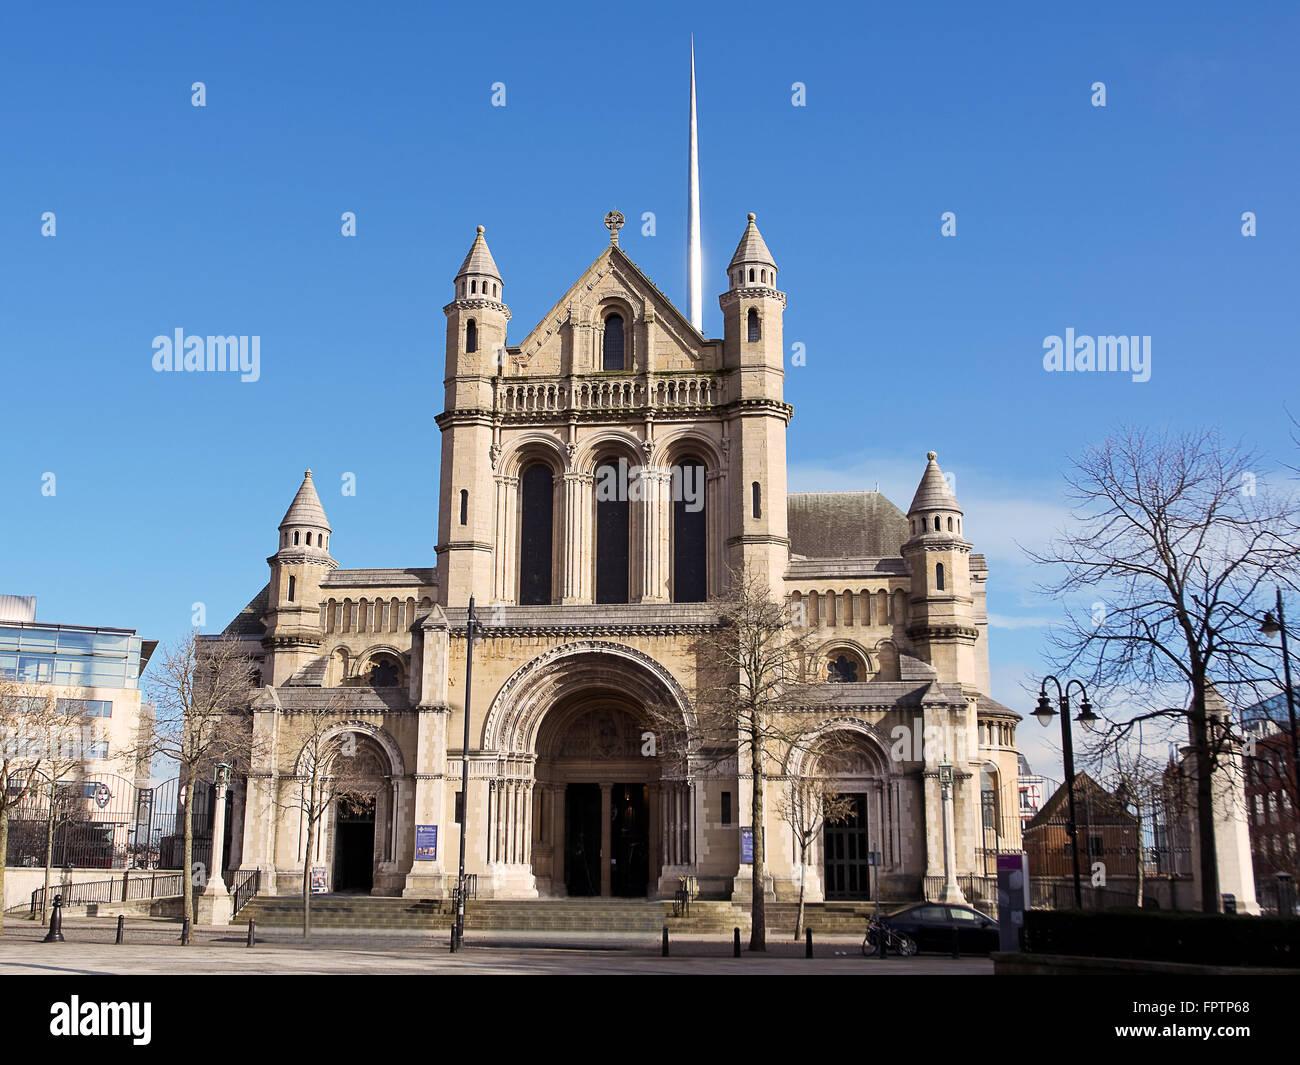 Saint Anne church in Belfast - Stock Image